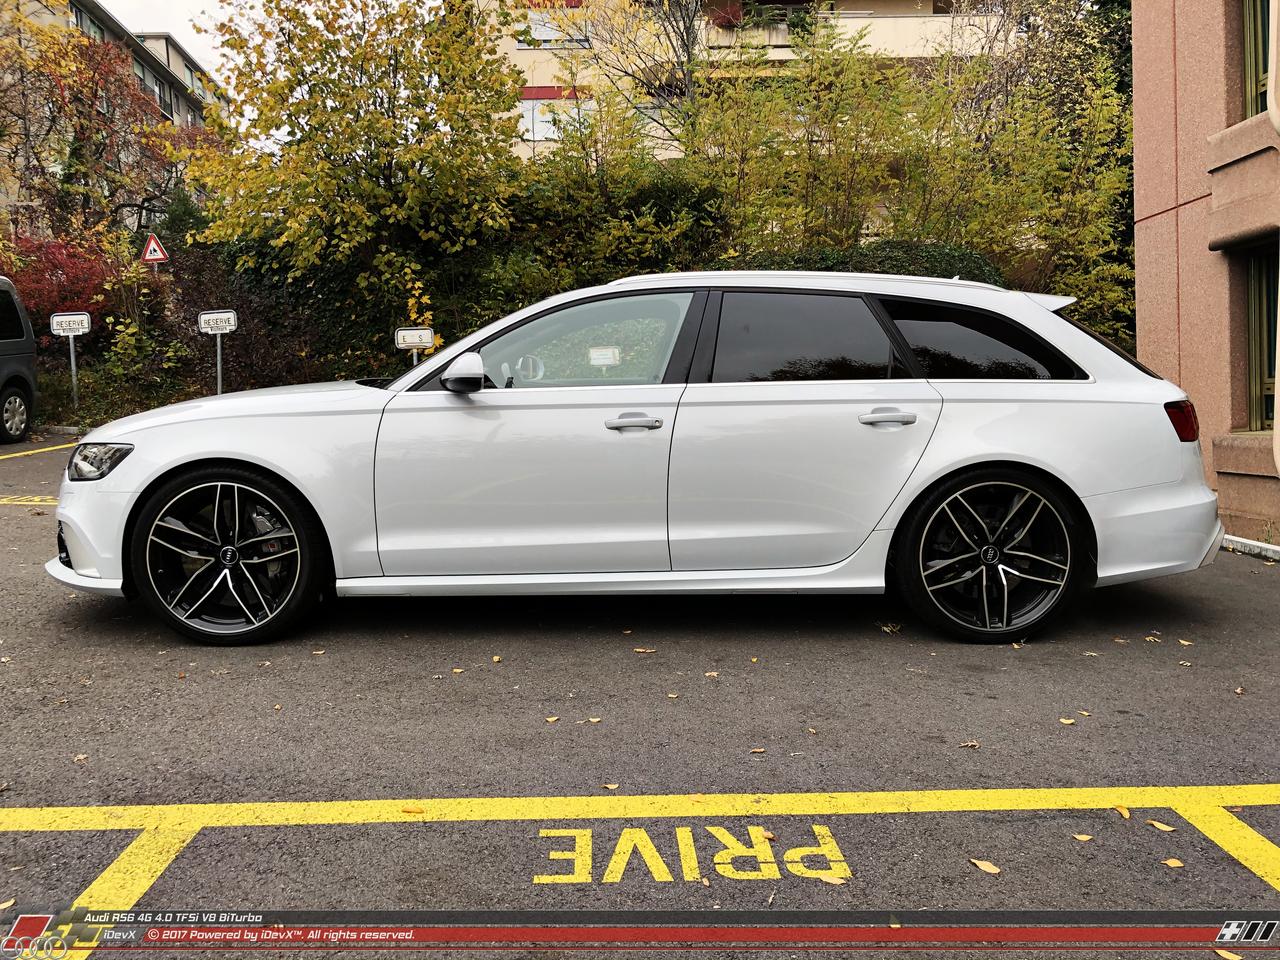 10_11.2018_Audi-RS6_iDevX_028.png